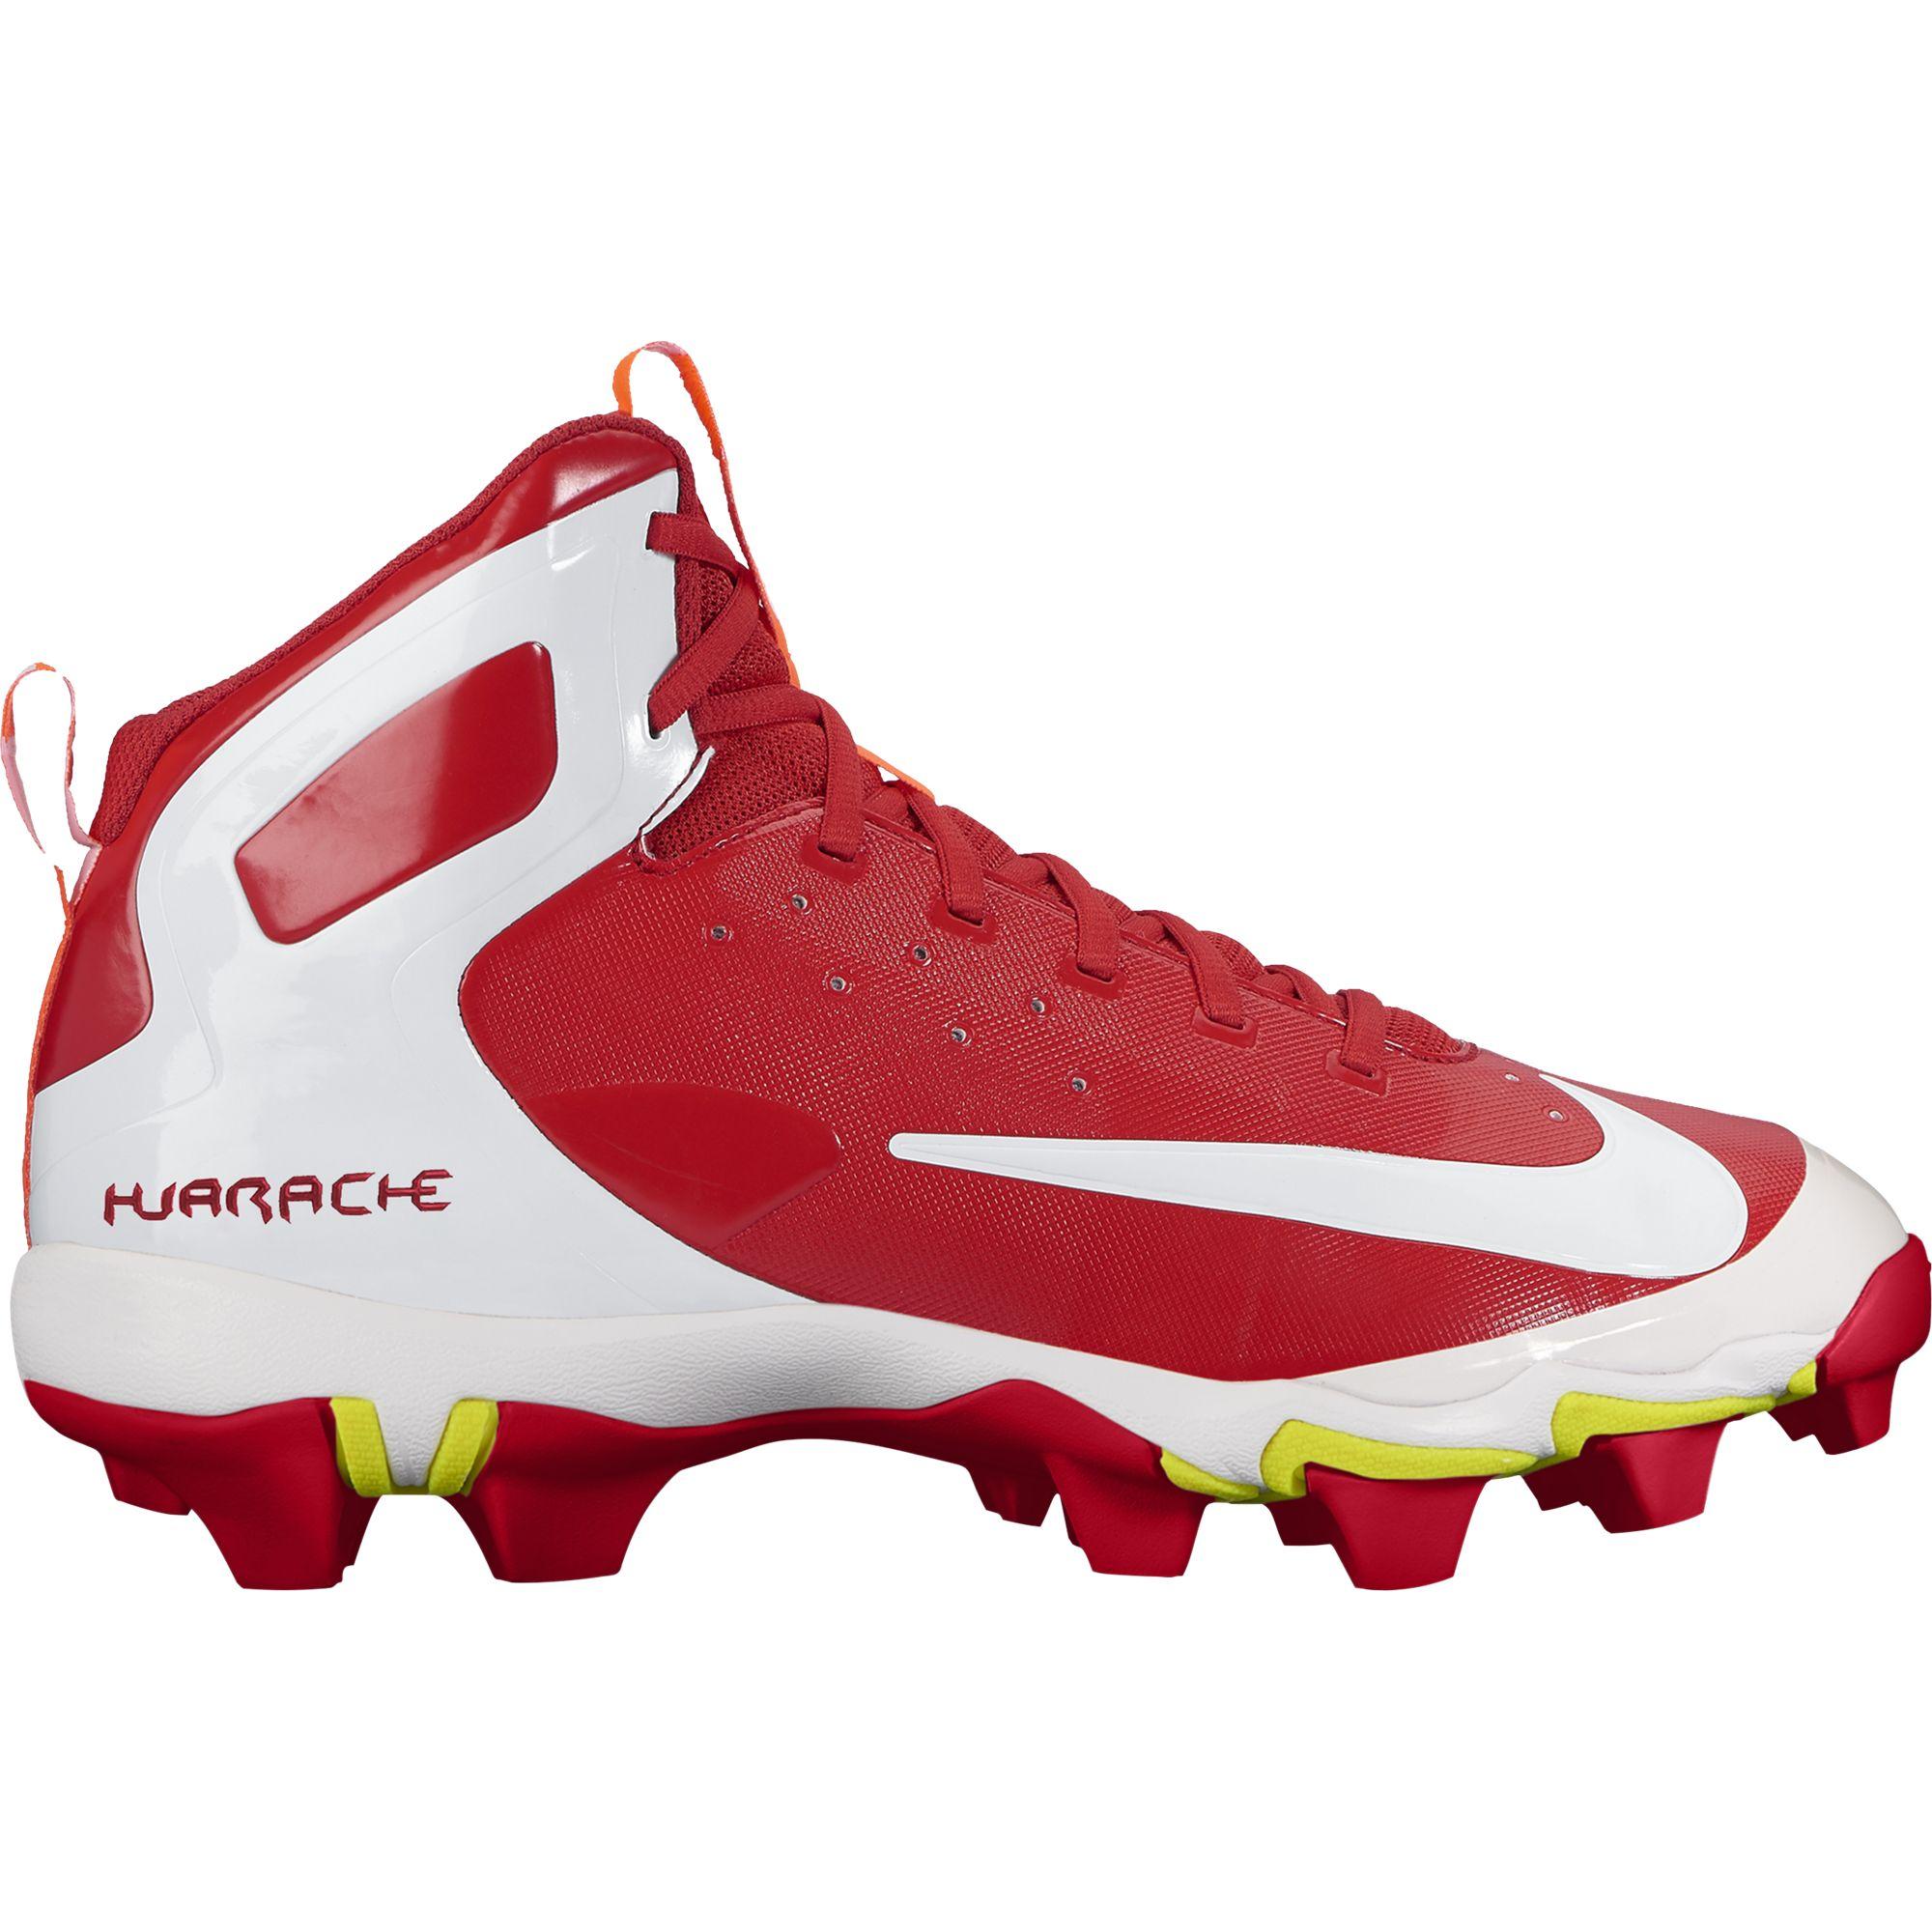 0912c4b6b8874 Men s Nike Alpha Huarache Keystone Mid Baseball Cleat - Sieverts Sporting  Goods